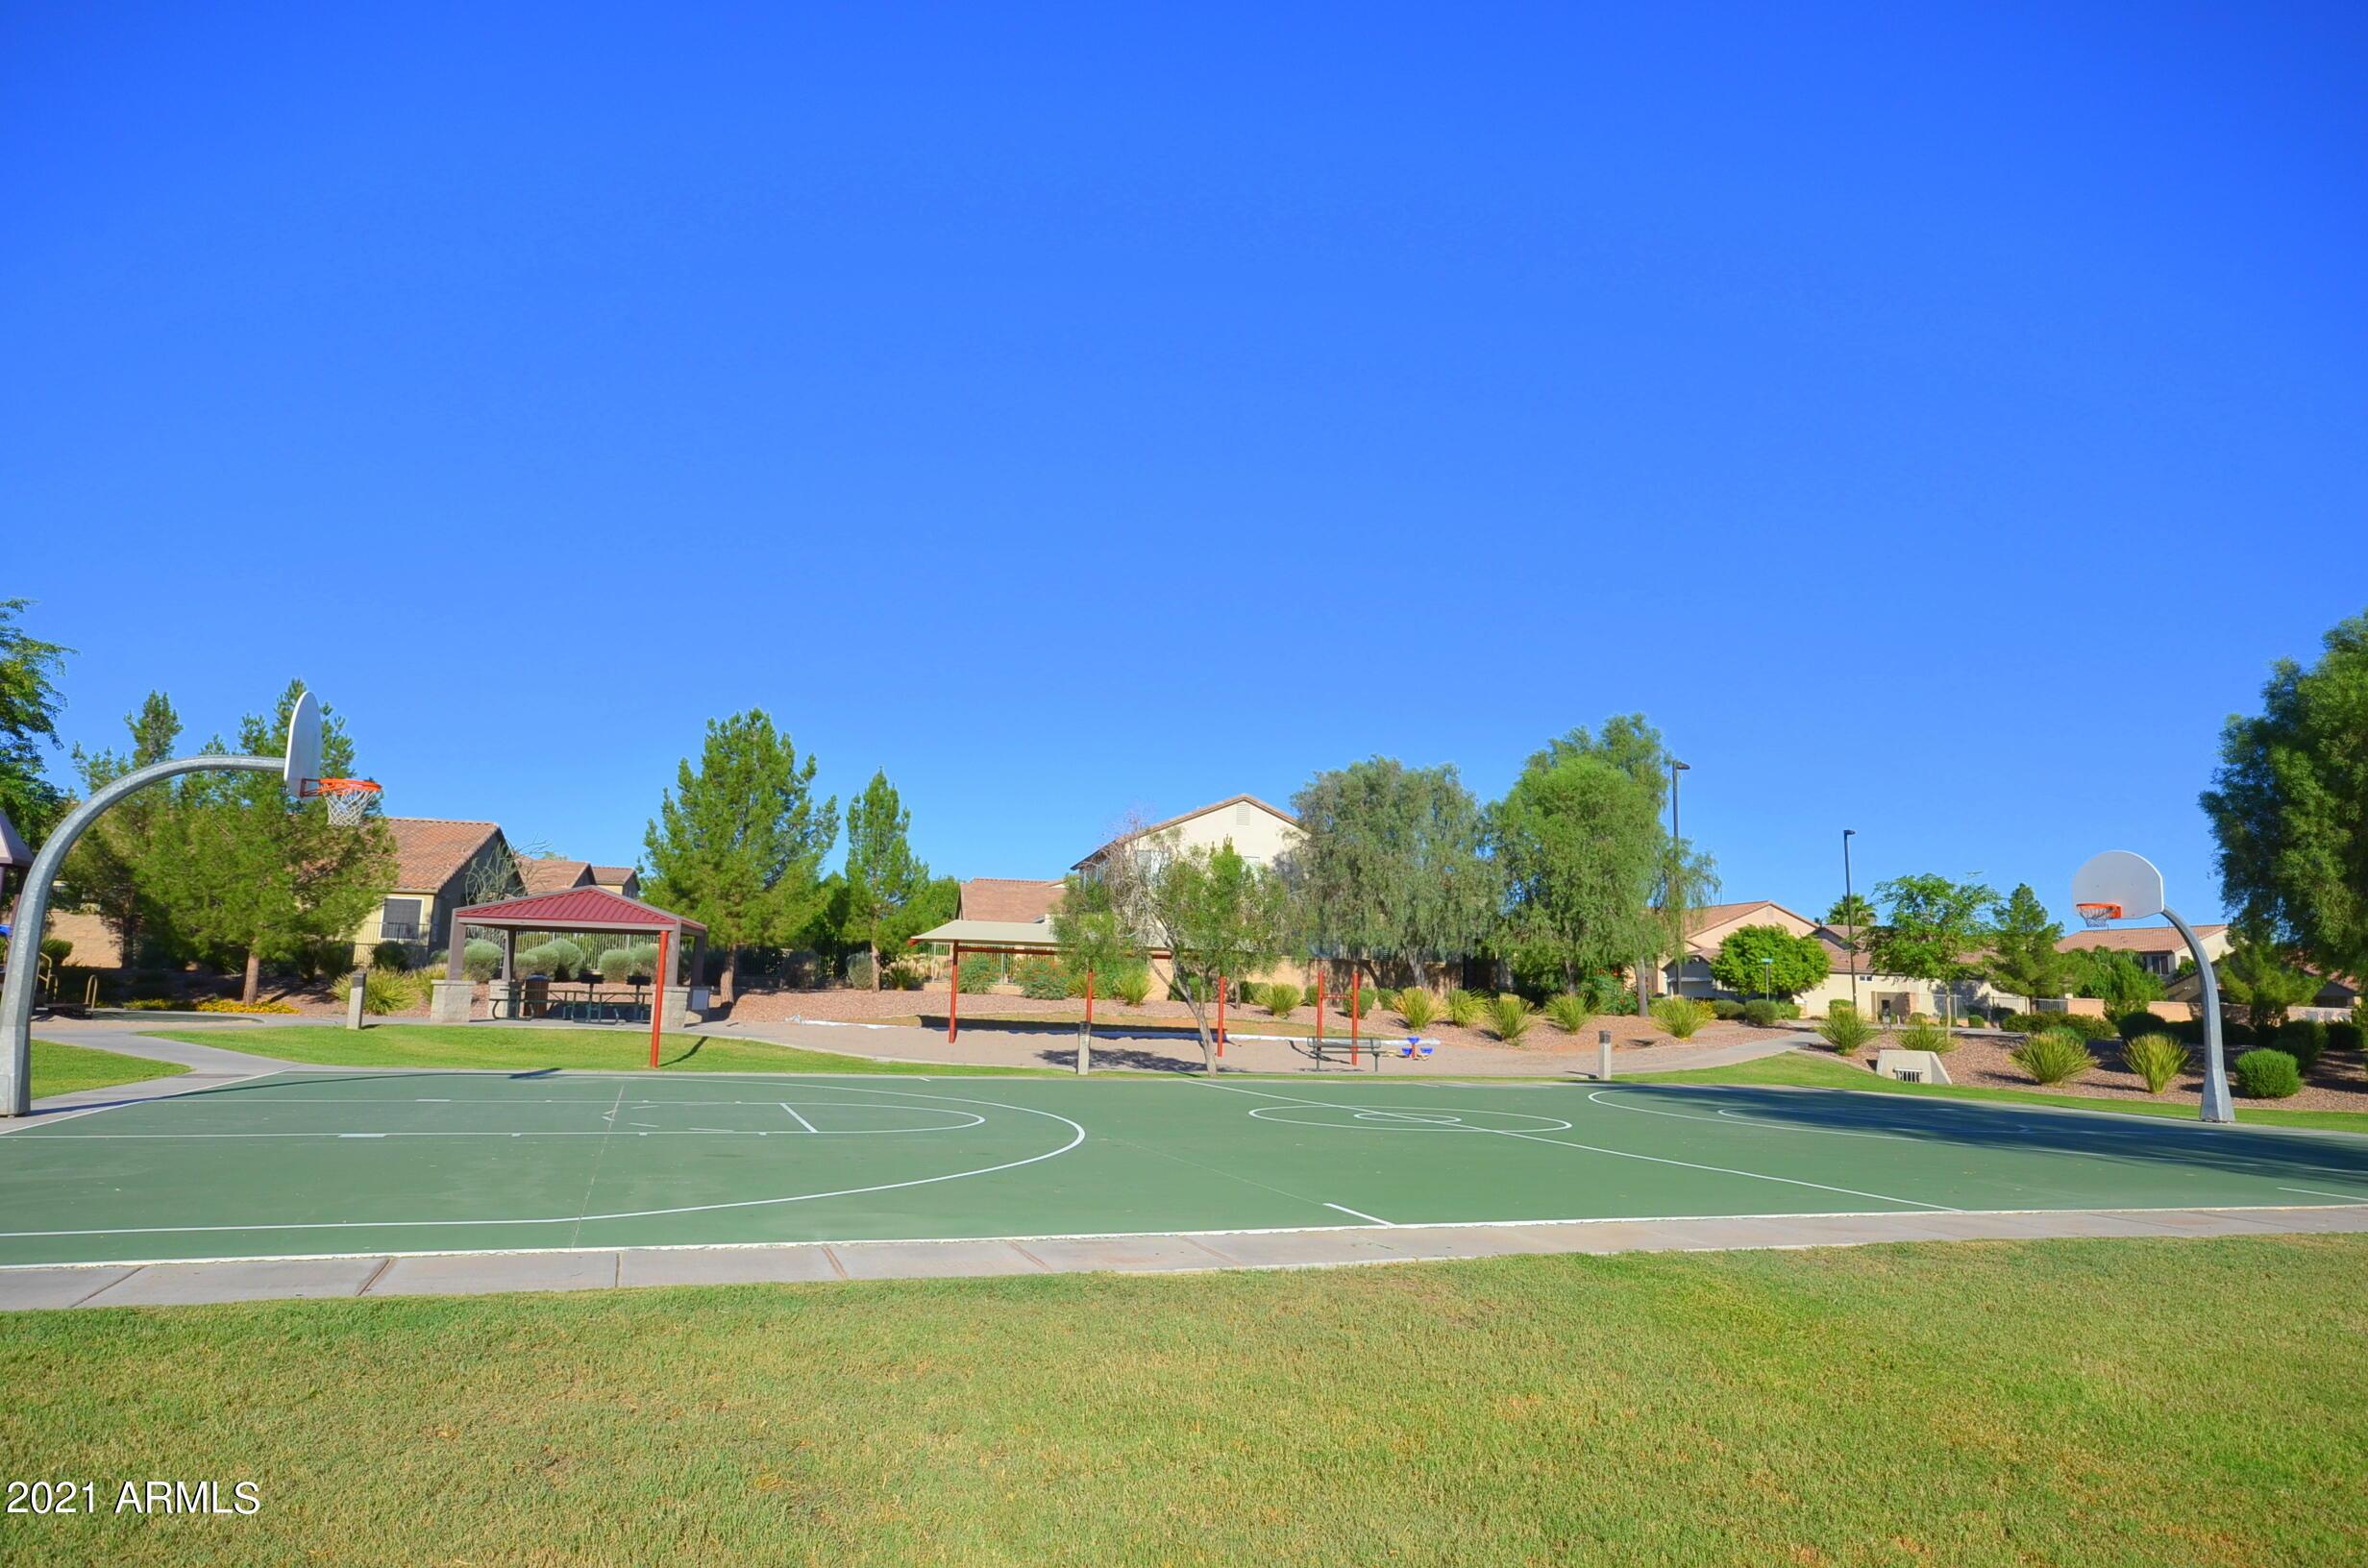 MLS 6299014 514 W SIERRA MADRE Avenue, Gilbert, AZ 85233 Eco-Friendly Homes